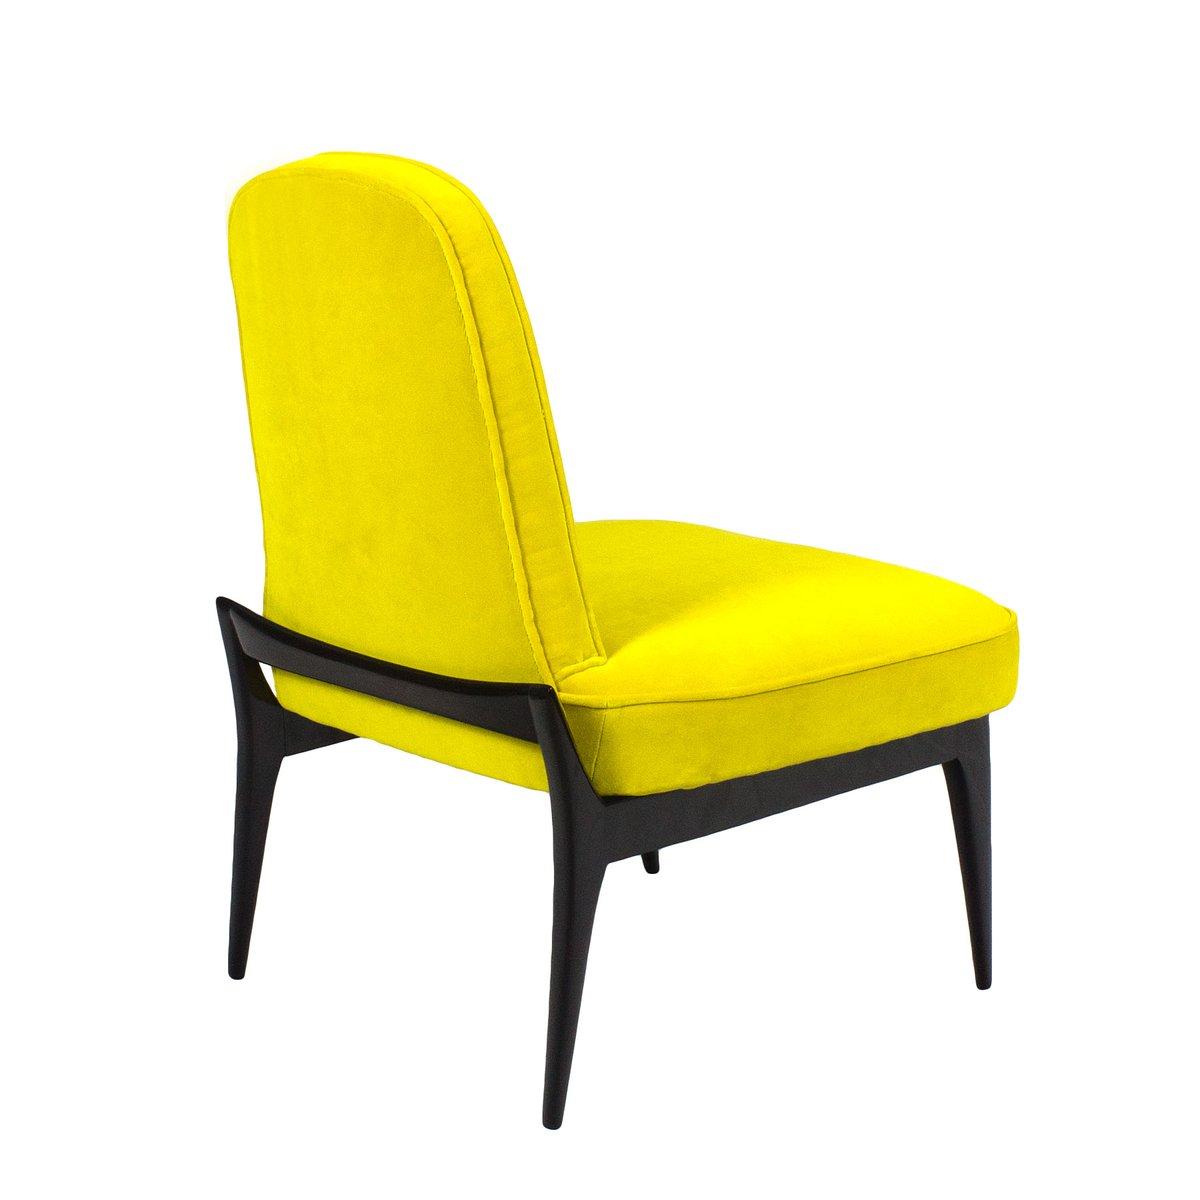 niedrige gelbe italienische sessel 1950er 2er set bei pamono kaufen. Black Bedroom Furniture Sets. Home Design Ideas